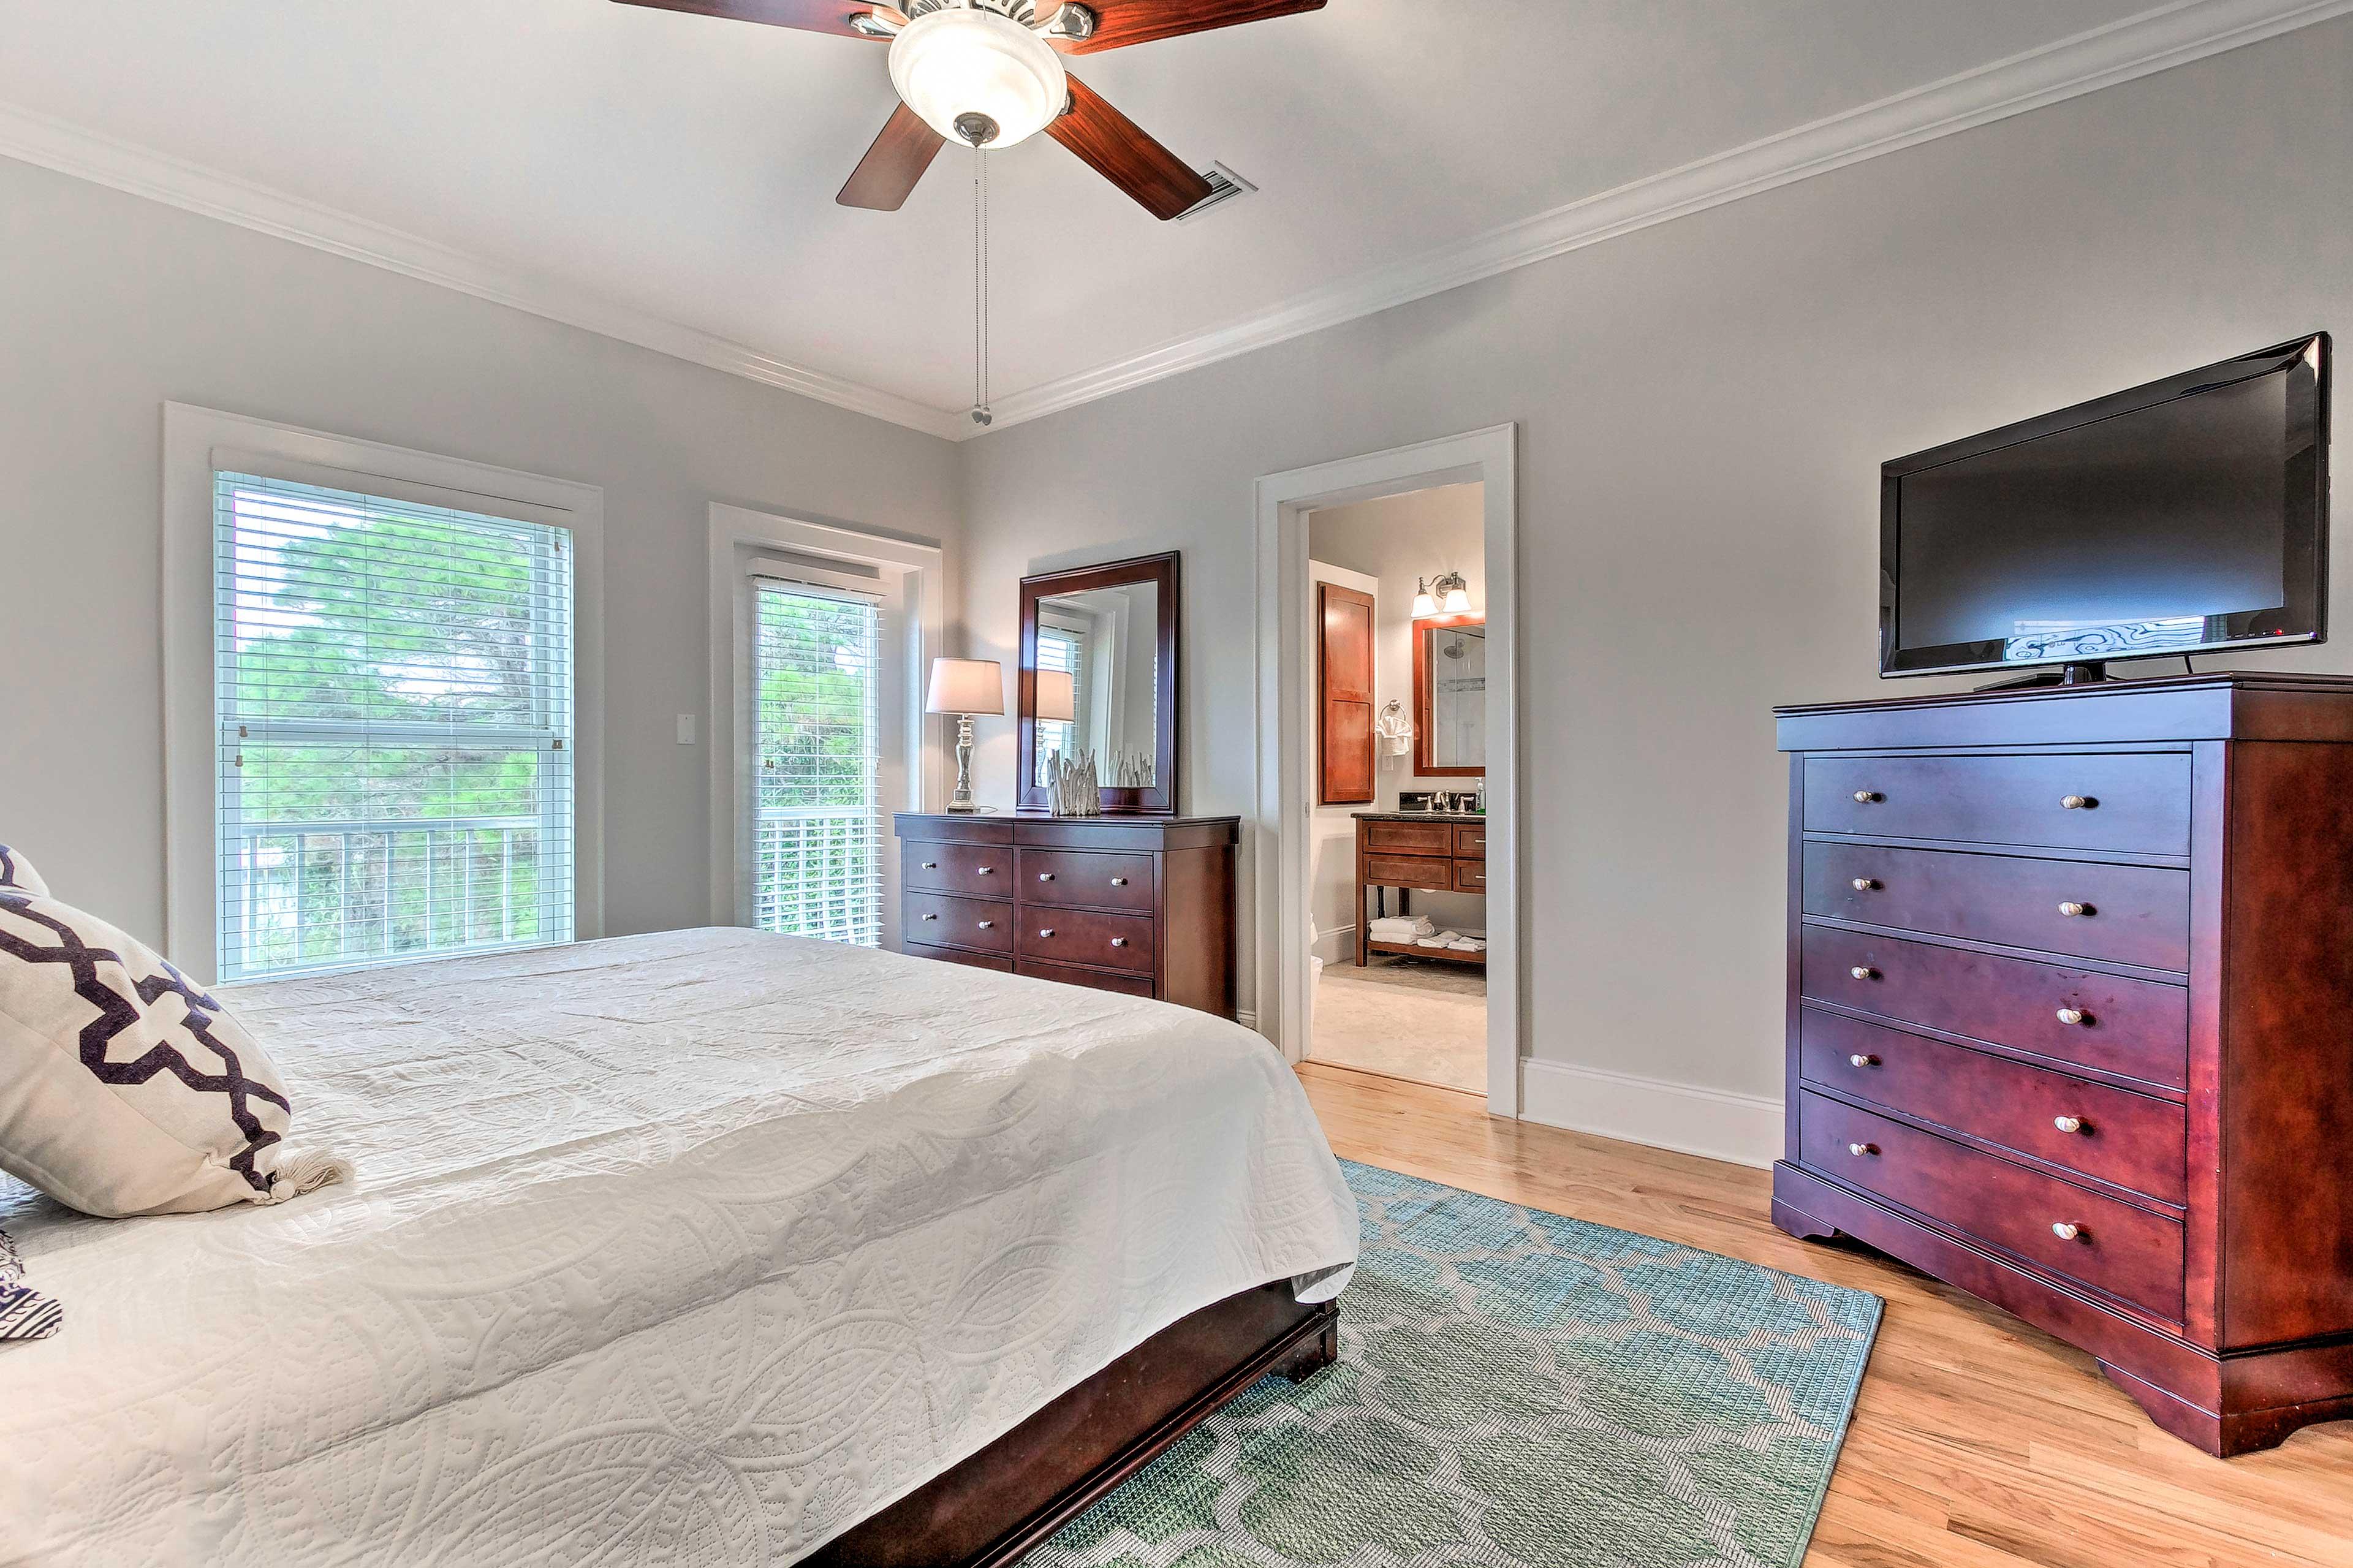 This comfortable bedroom offers a Smart TV & en-suite bath.